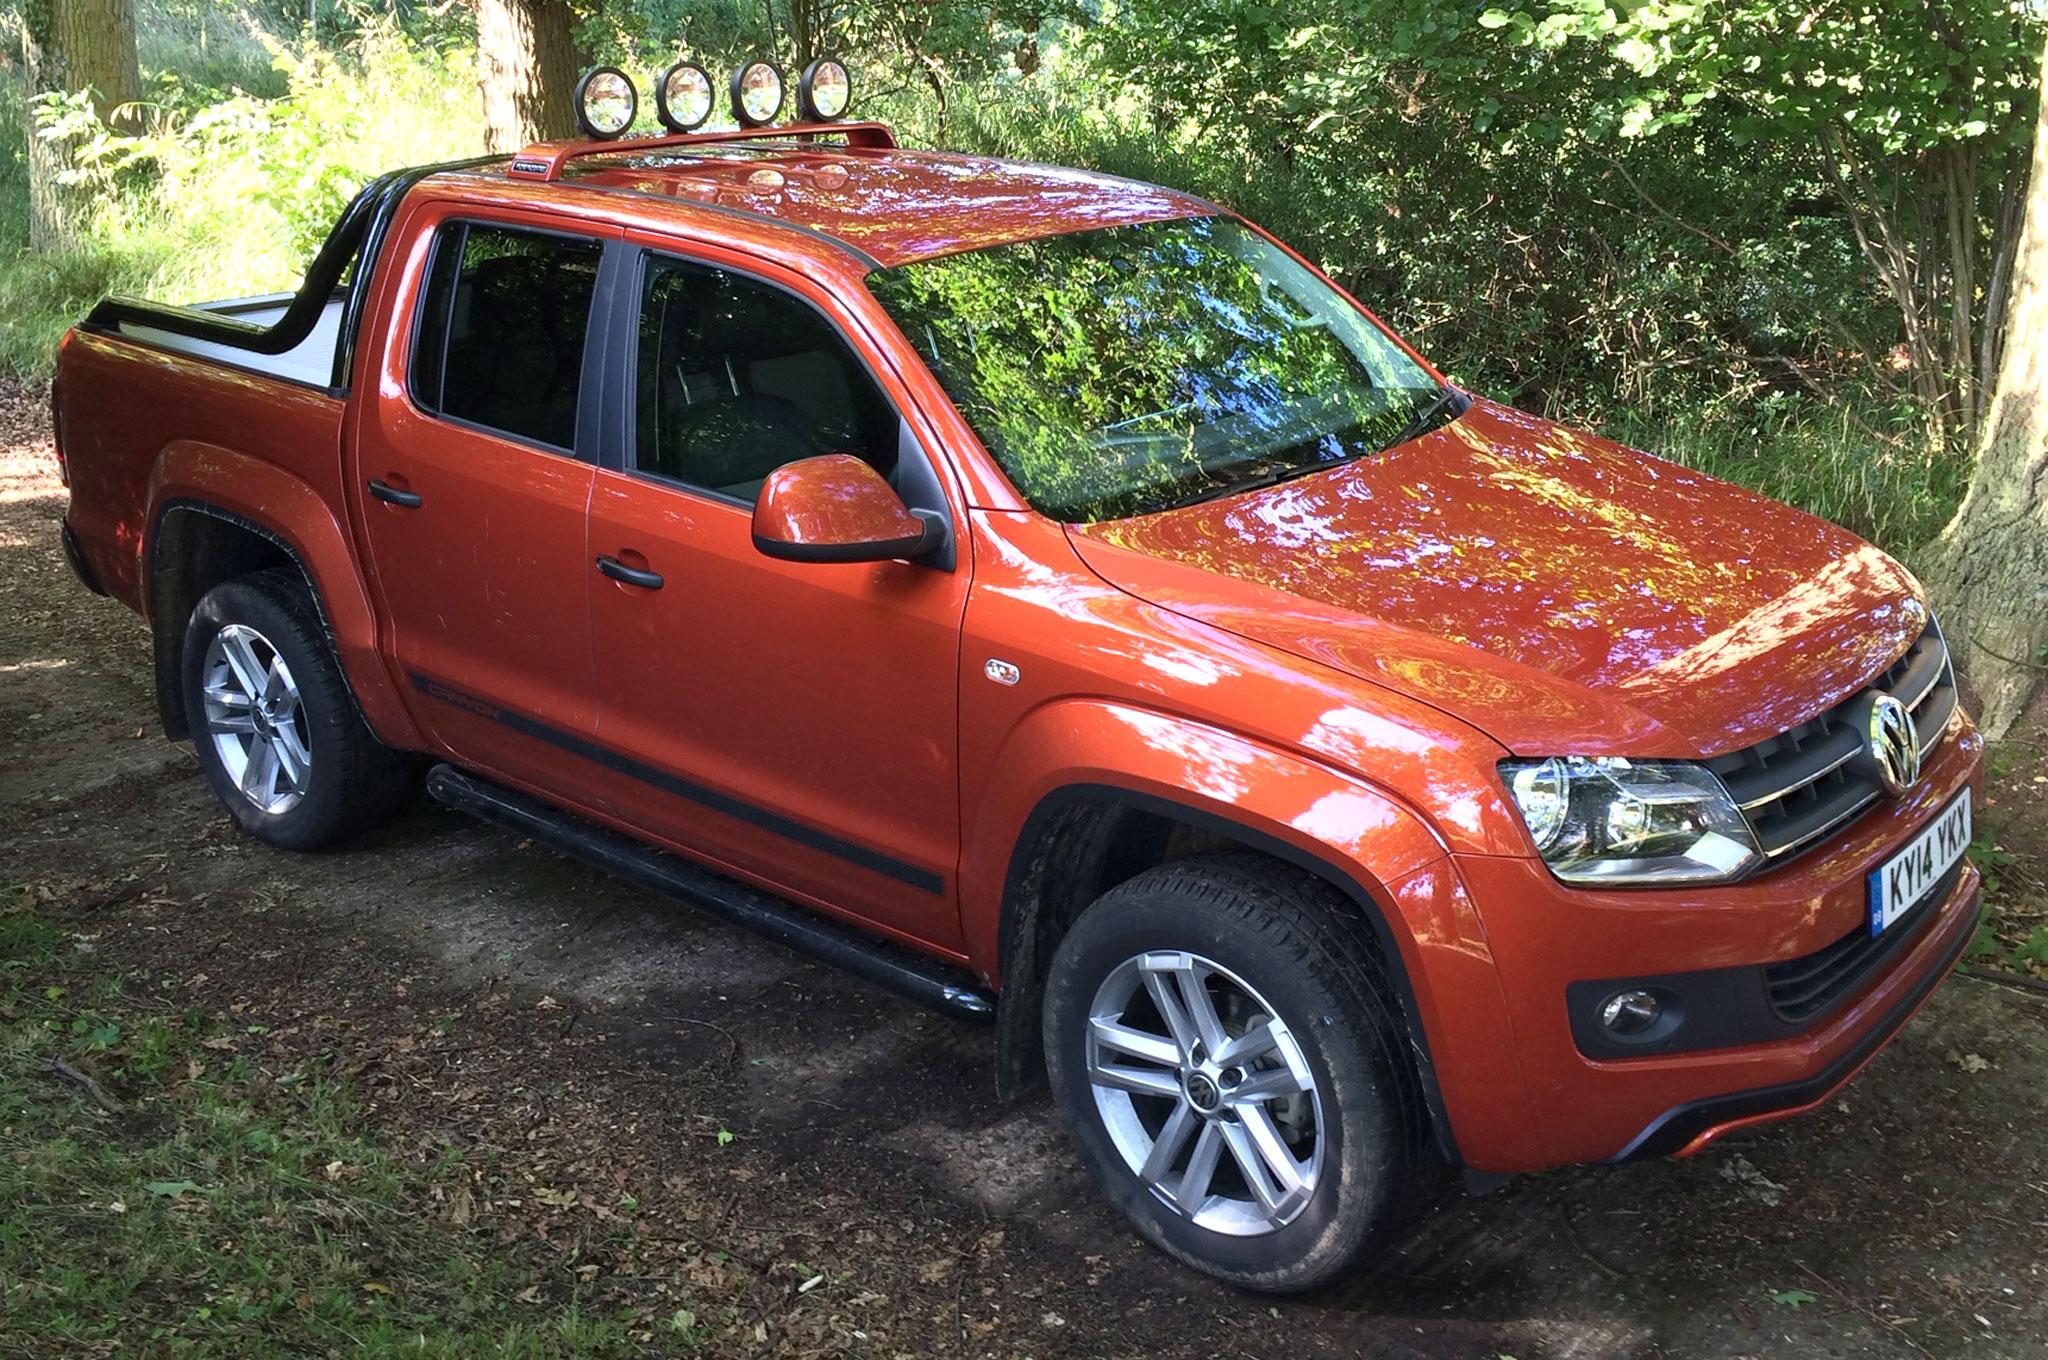 2014 Volkswagen Amarok Canyon Review